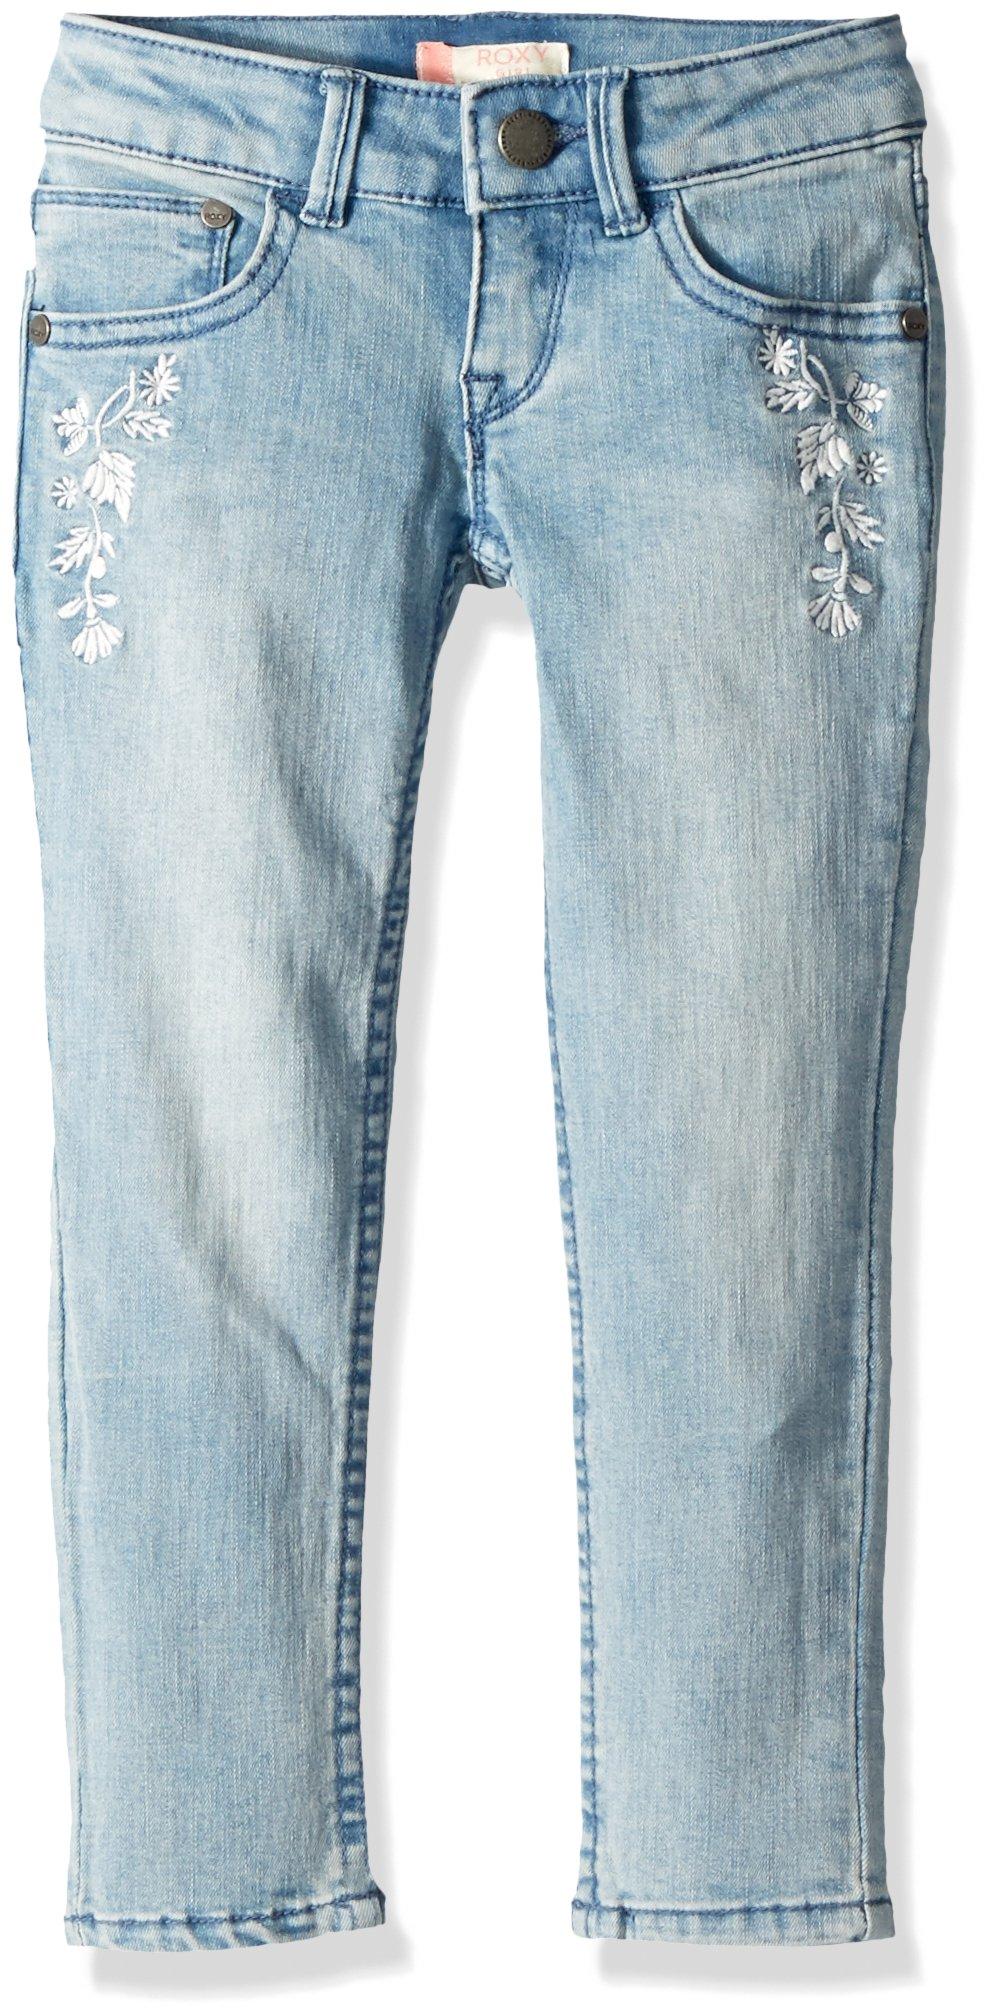 Roxy Little Girls' Blow Me Away Denim Pants, Vintage Wash, 6